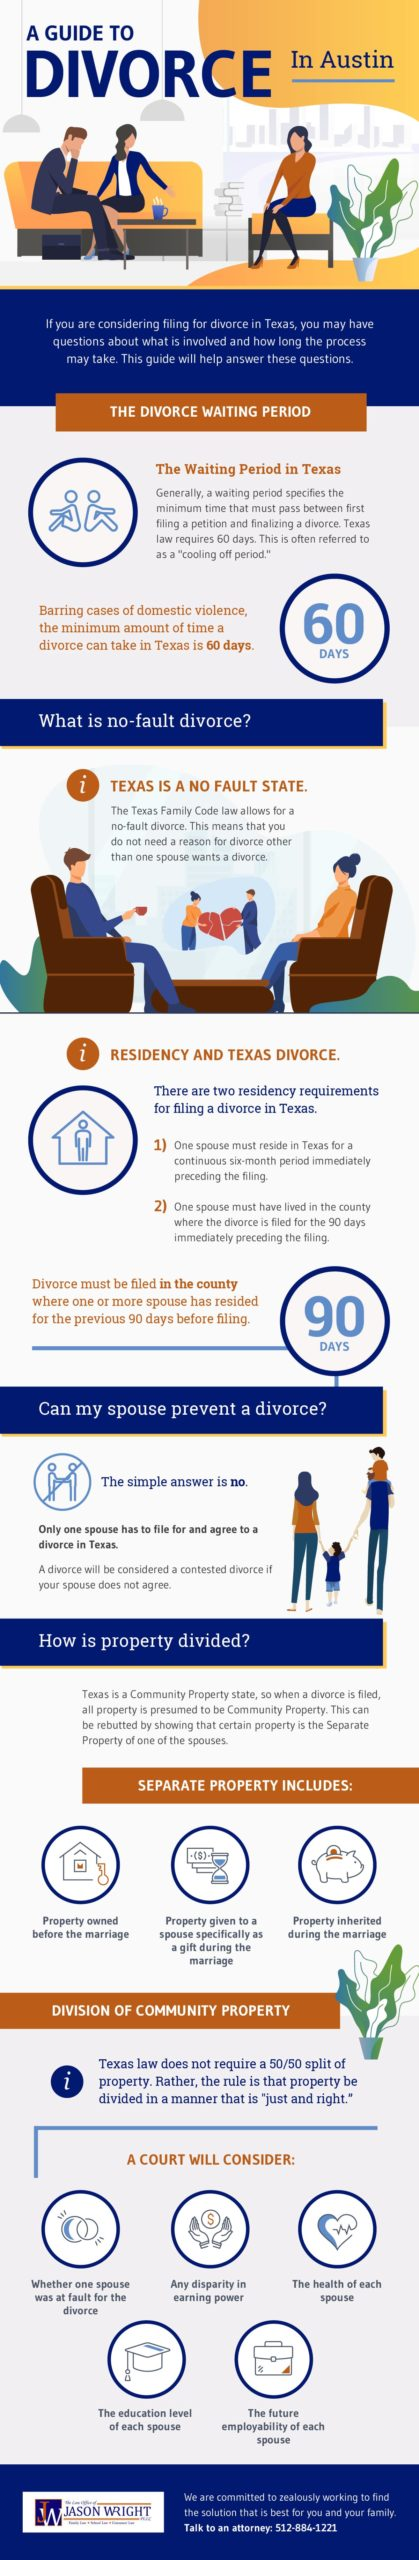 Austin divorce lawyer